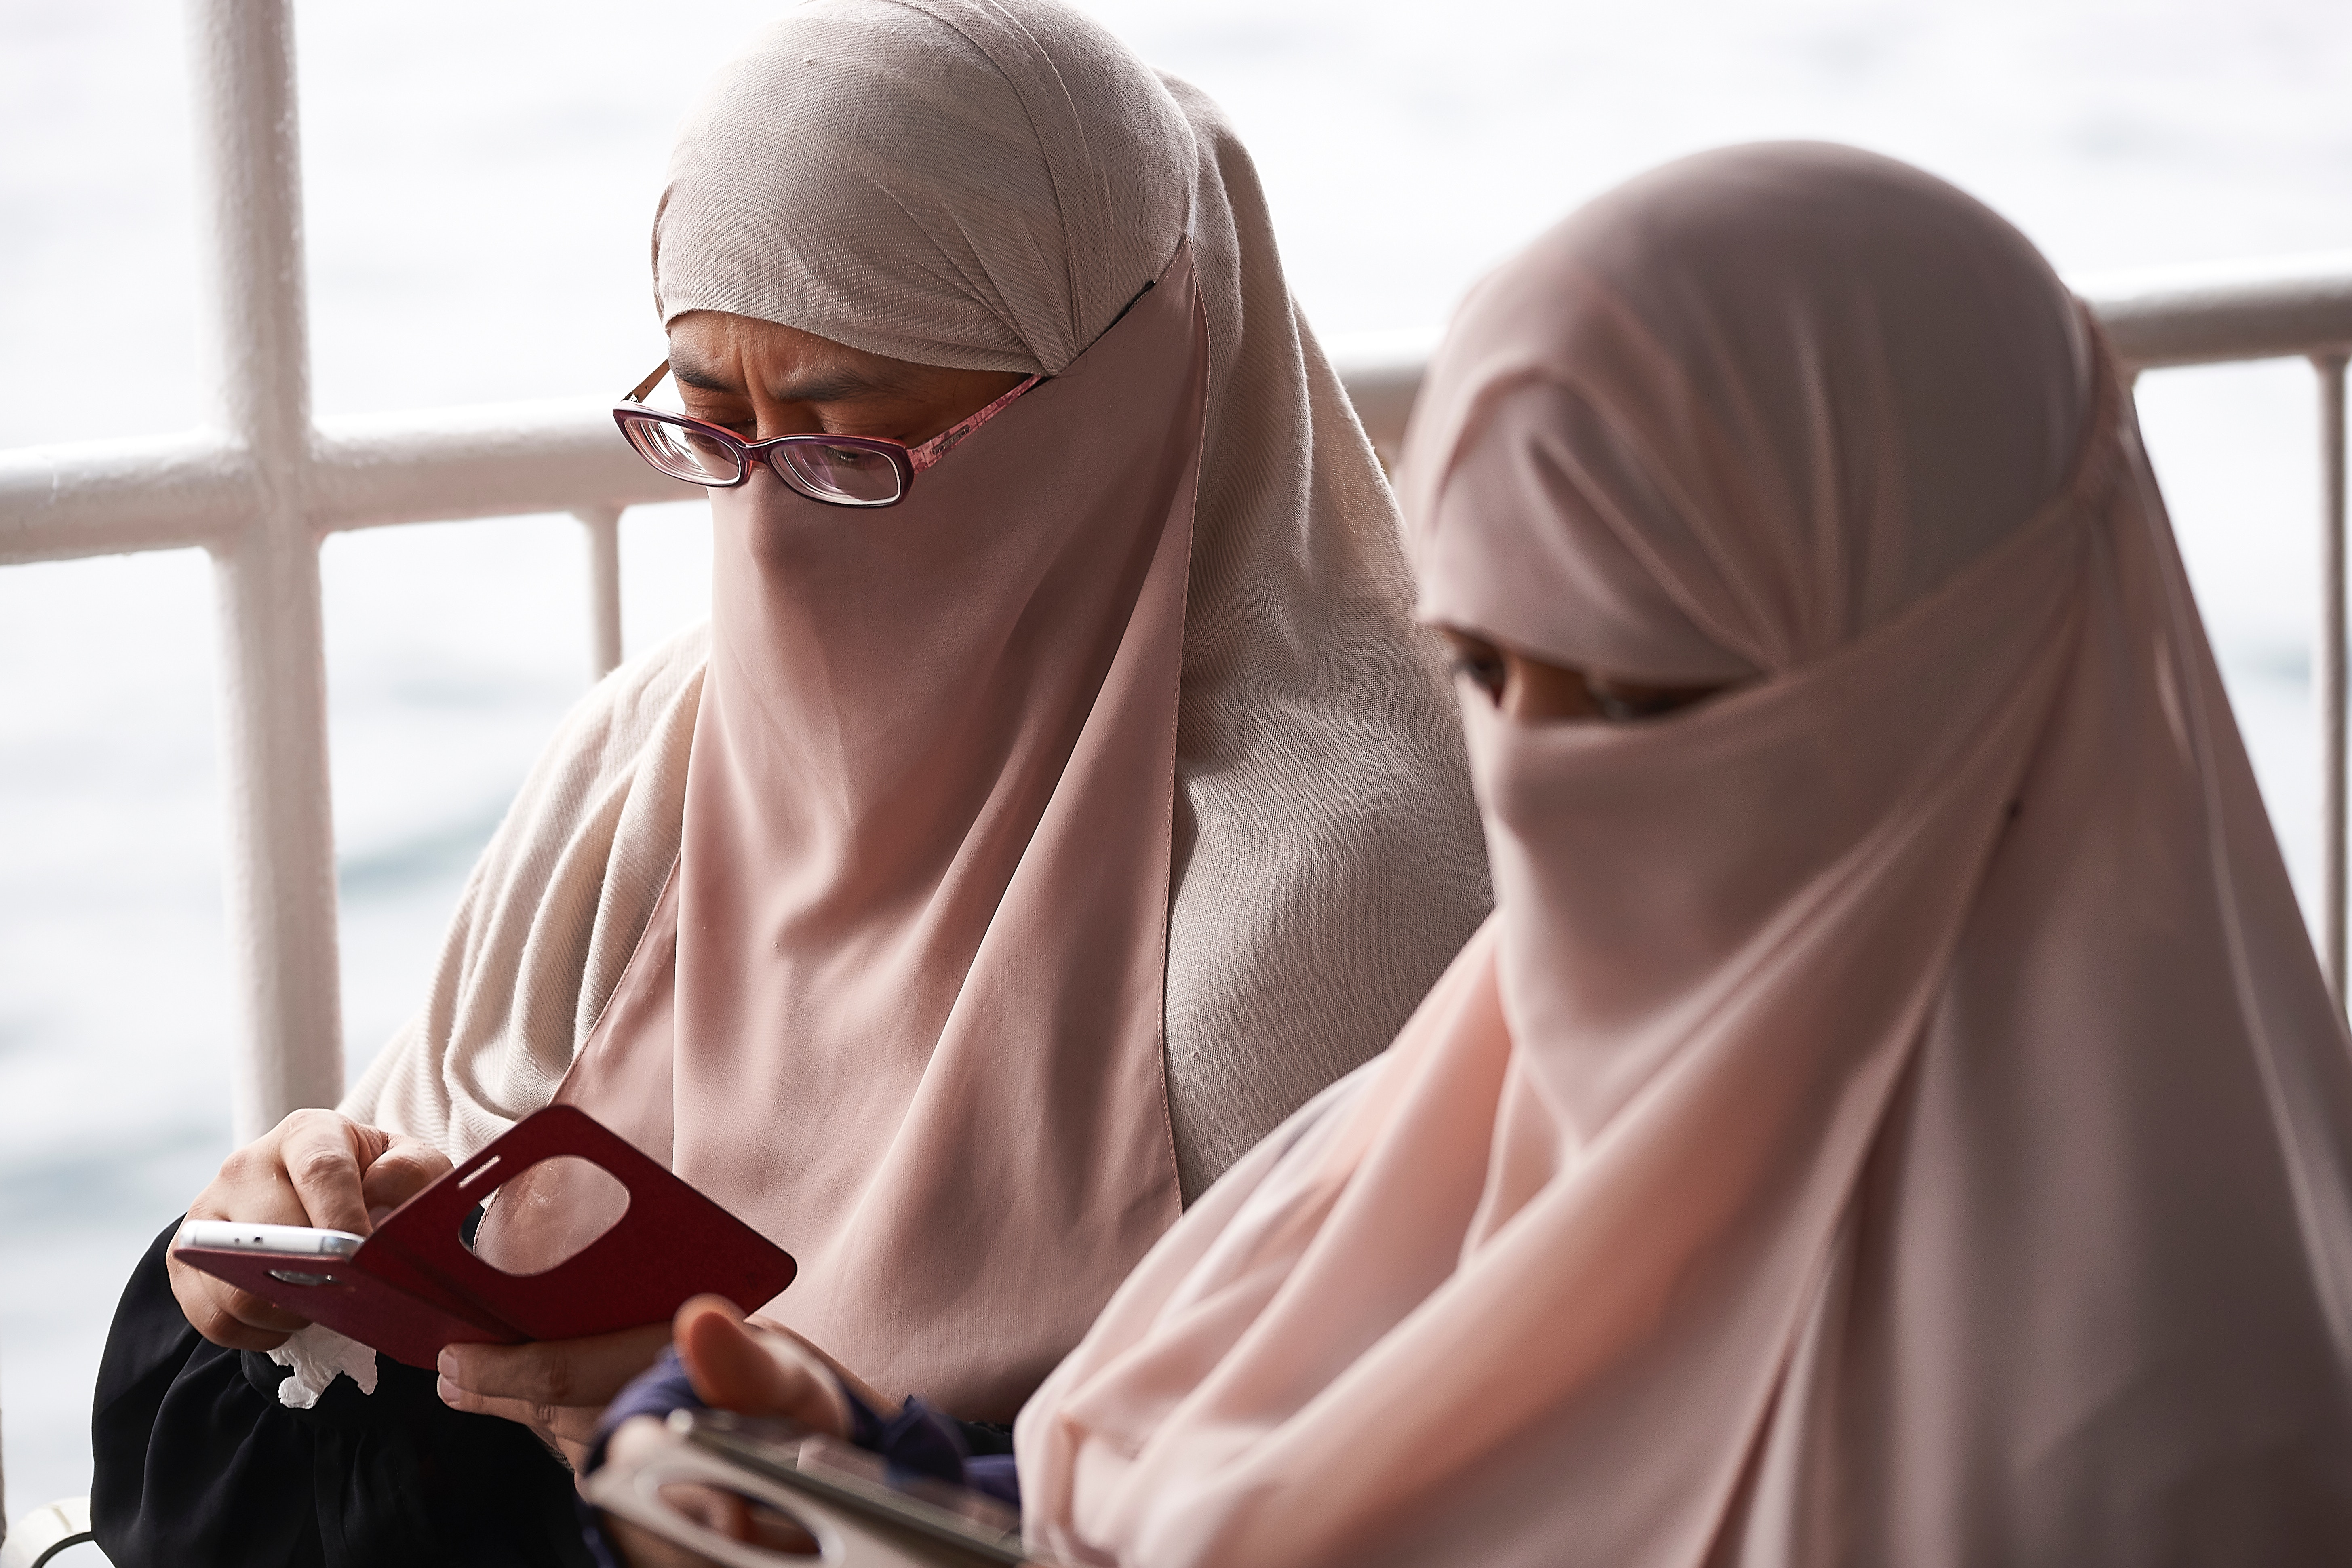 Conservative Hijab